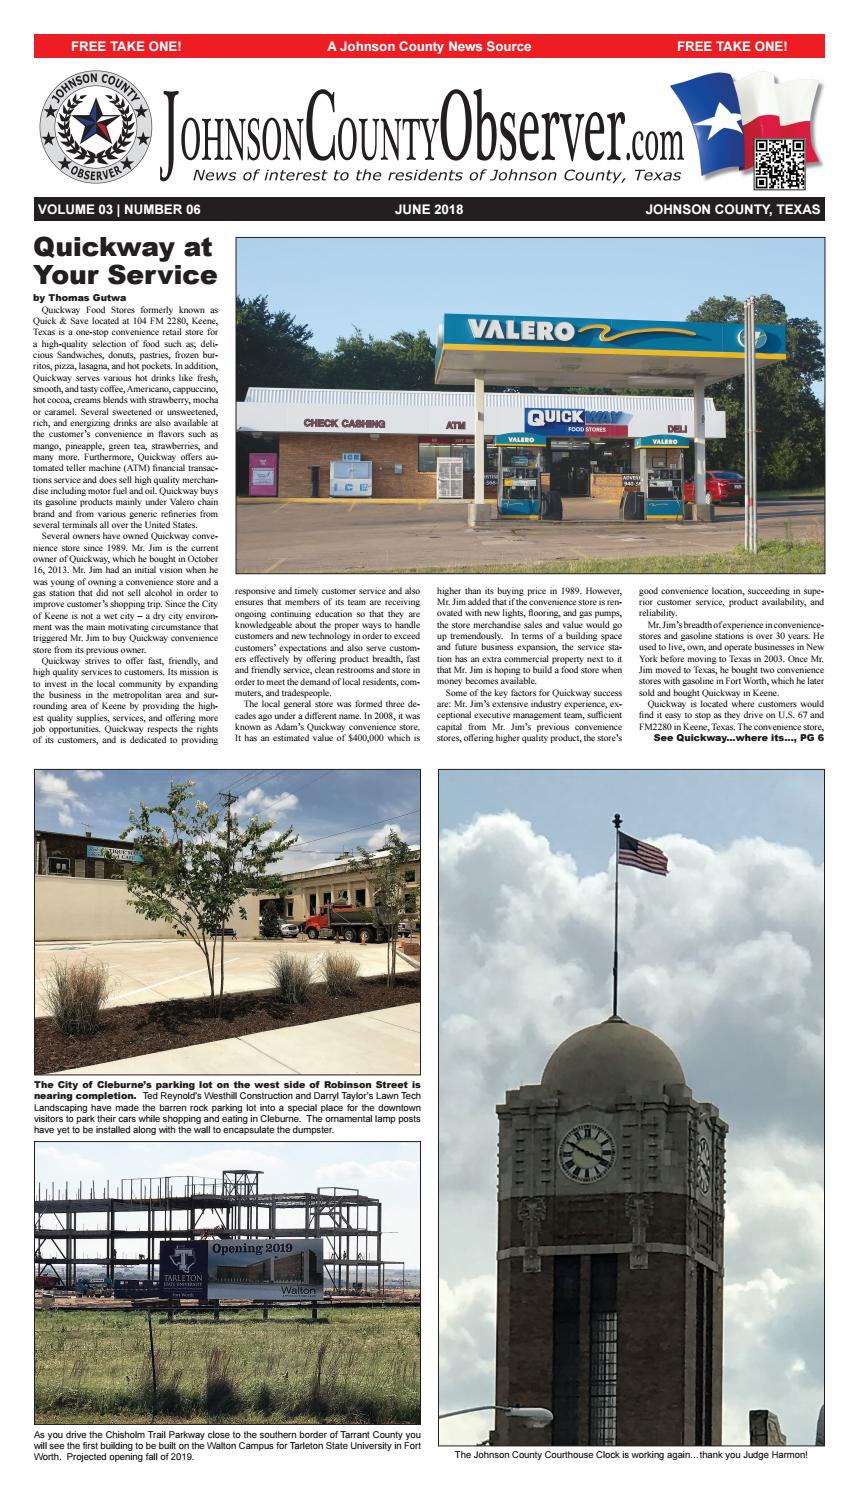 Johnson County Observer June 2018 by Johnson County Observer